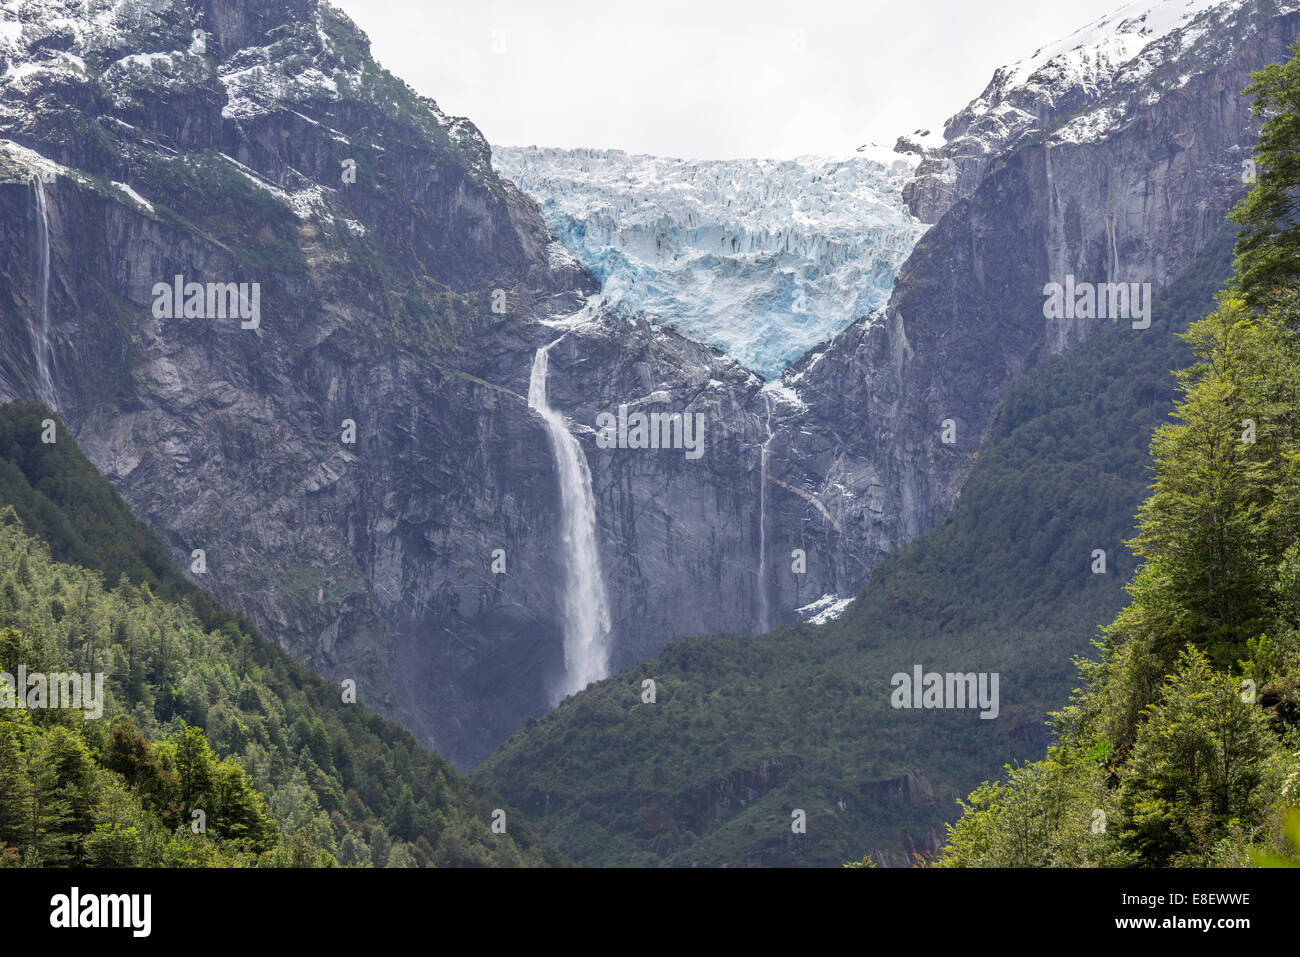 Ventisquero Colgante, hanging glacier, Parc National Queulat, Puerto Puyuhuapi, Aysén, Chile - Stock Image